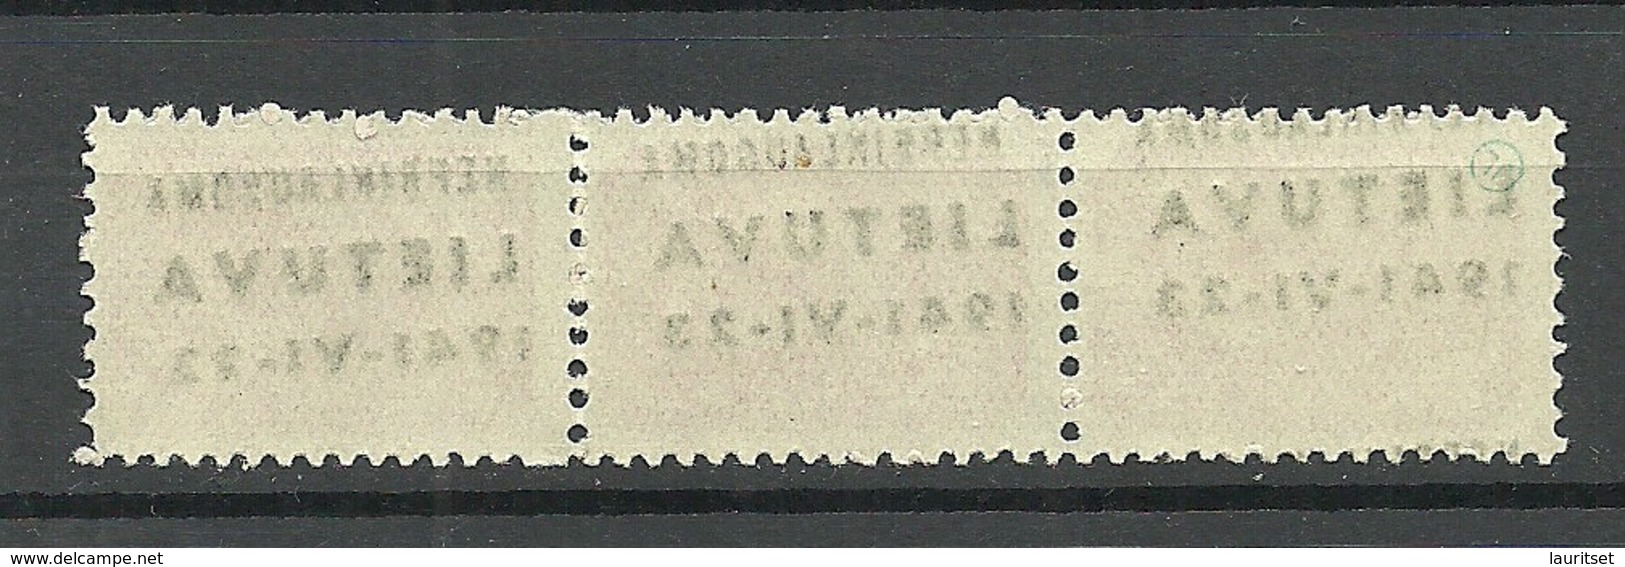 LITAUEN Lithuania 1941 German Occupation Michel 8 As 3-stripe ERROR VARIETY Abart MNH - Litauen